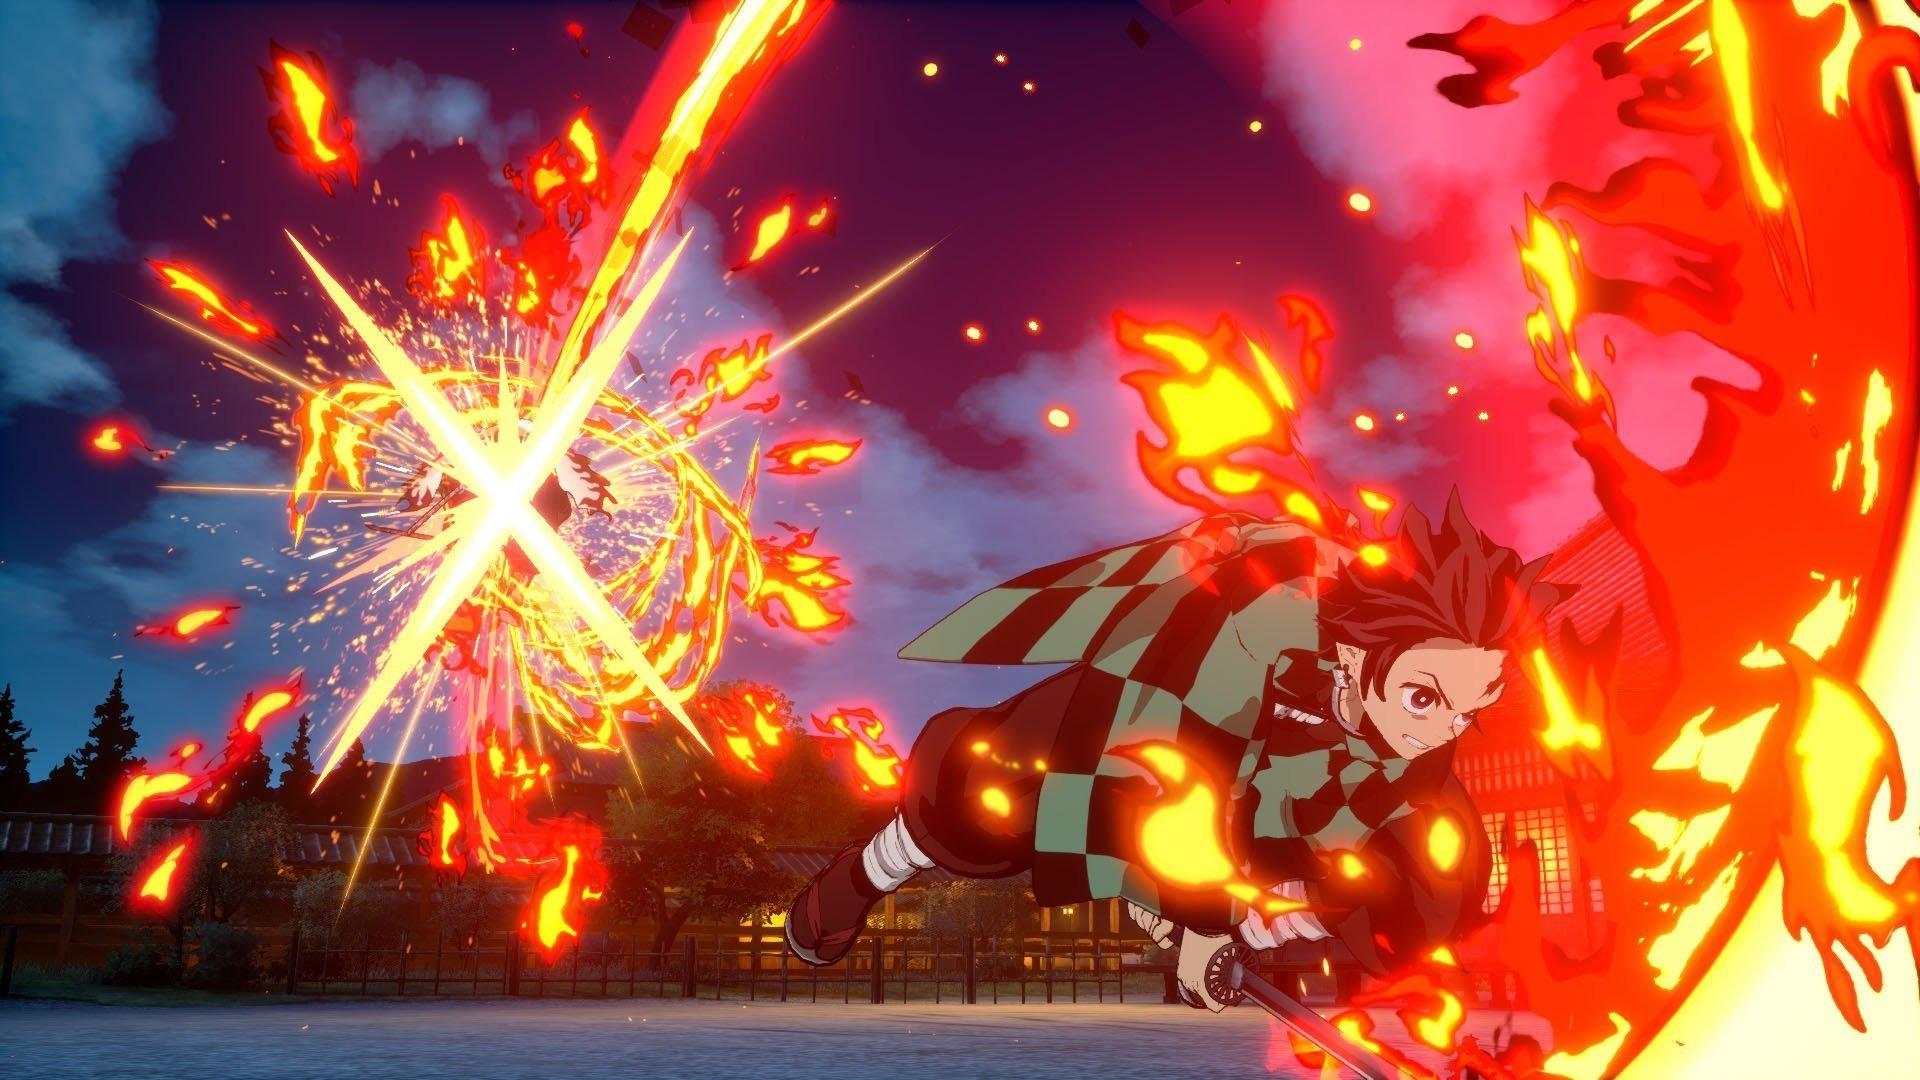 Demon Slayer Kimetsu no Yaiba The Hinokami Chronicles - Steam Pre Order Guide